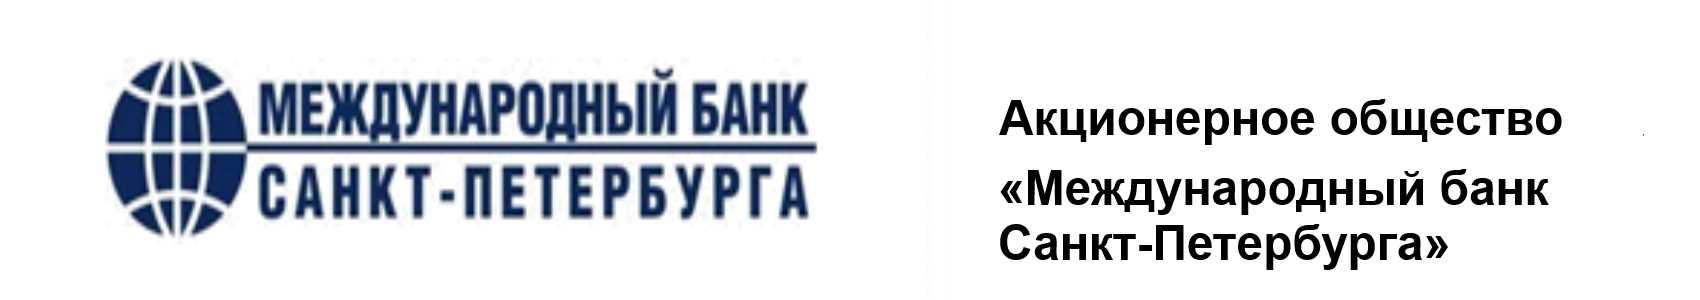 АО «Международный банк Санкт-Петербурга»